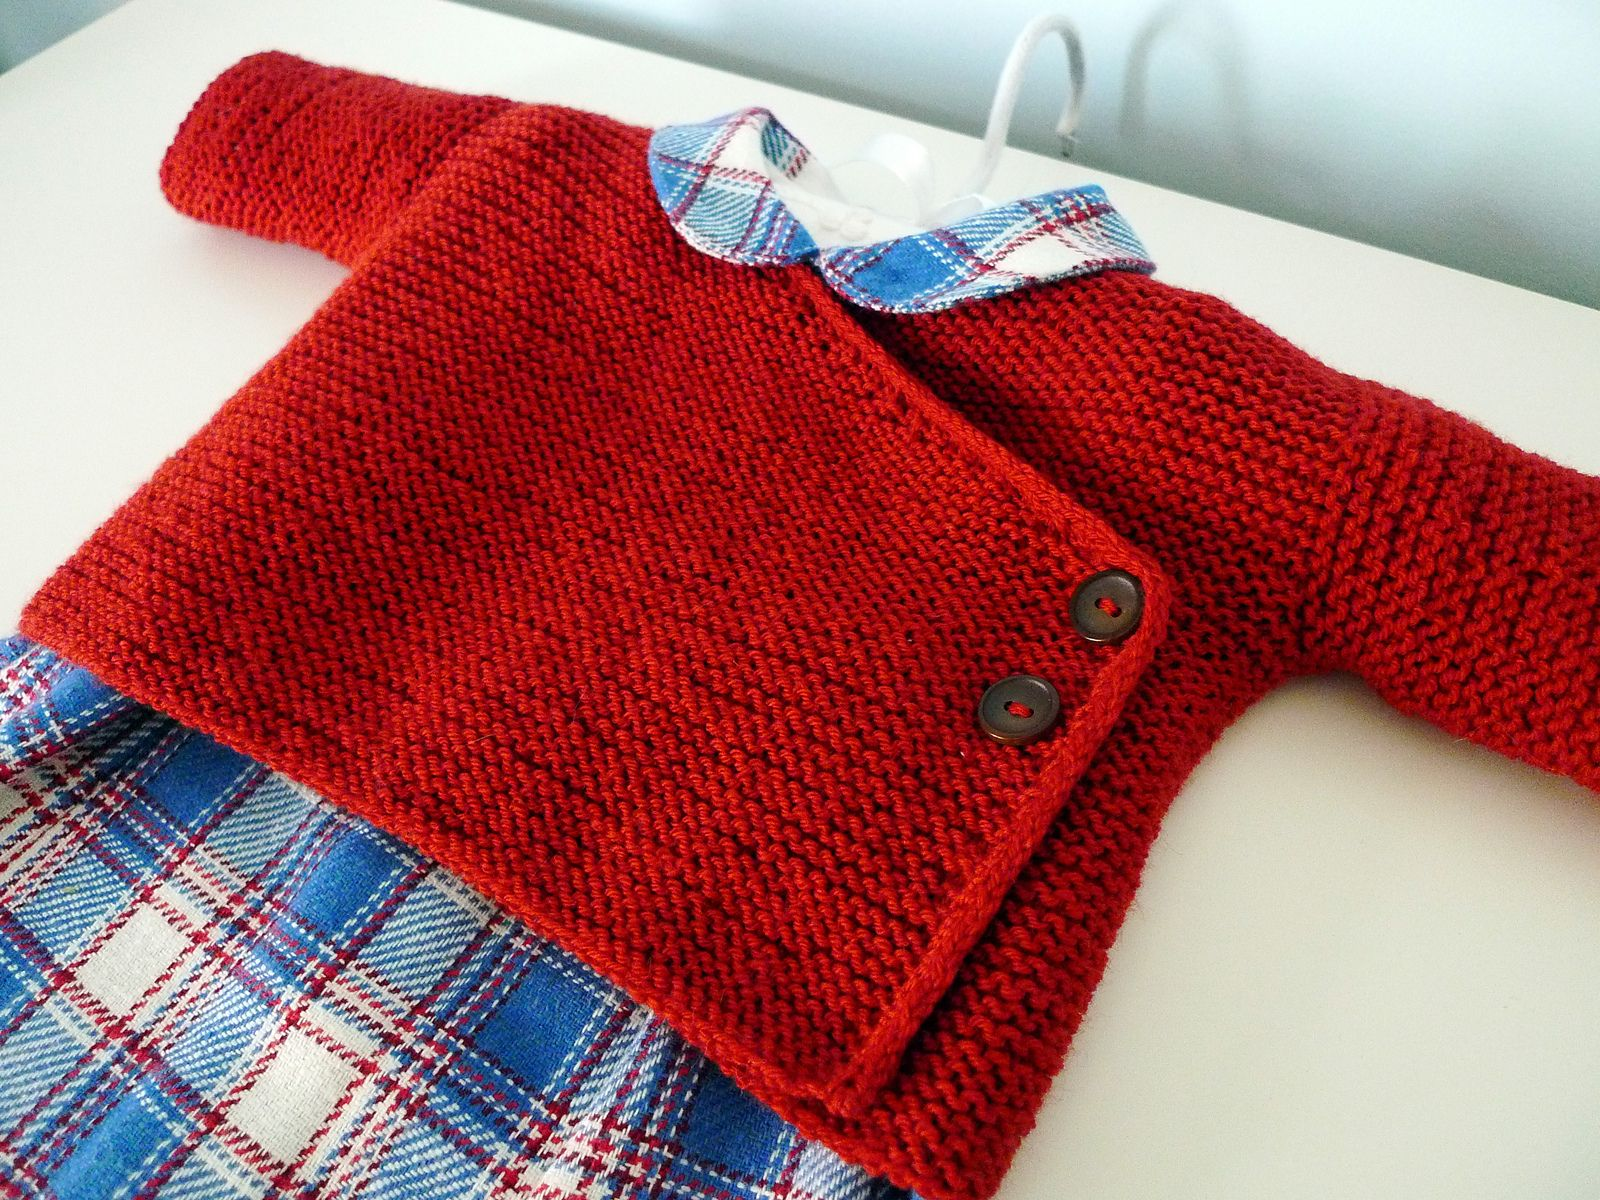 Ravelry: Garter Stitch Baby Kimono by Joji Locatelli | Knitting ...